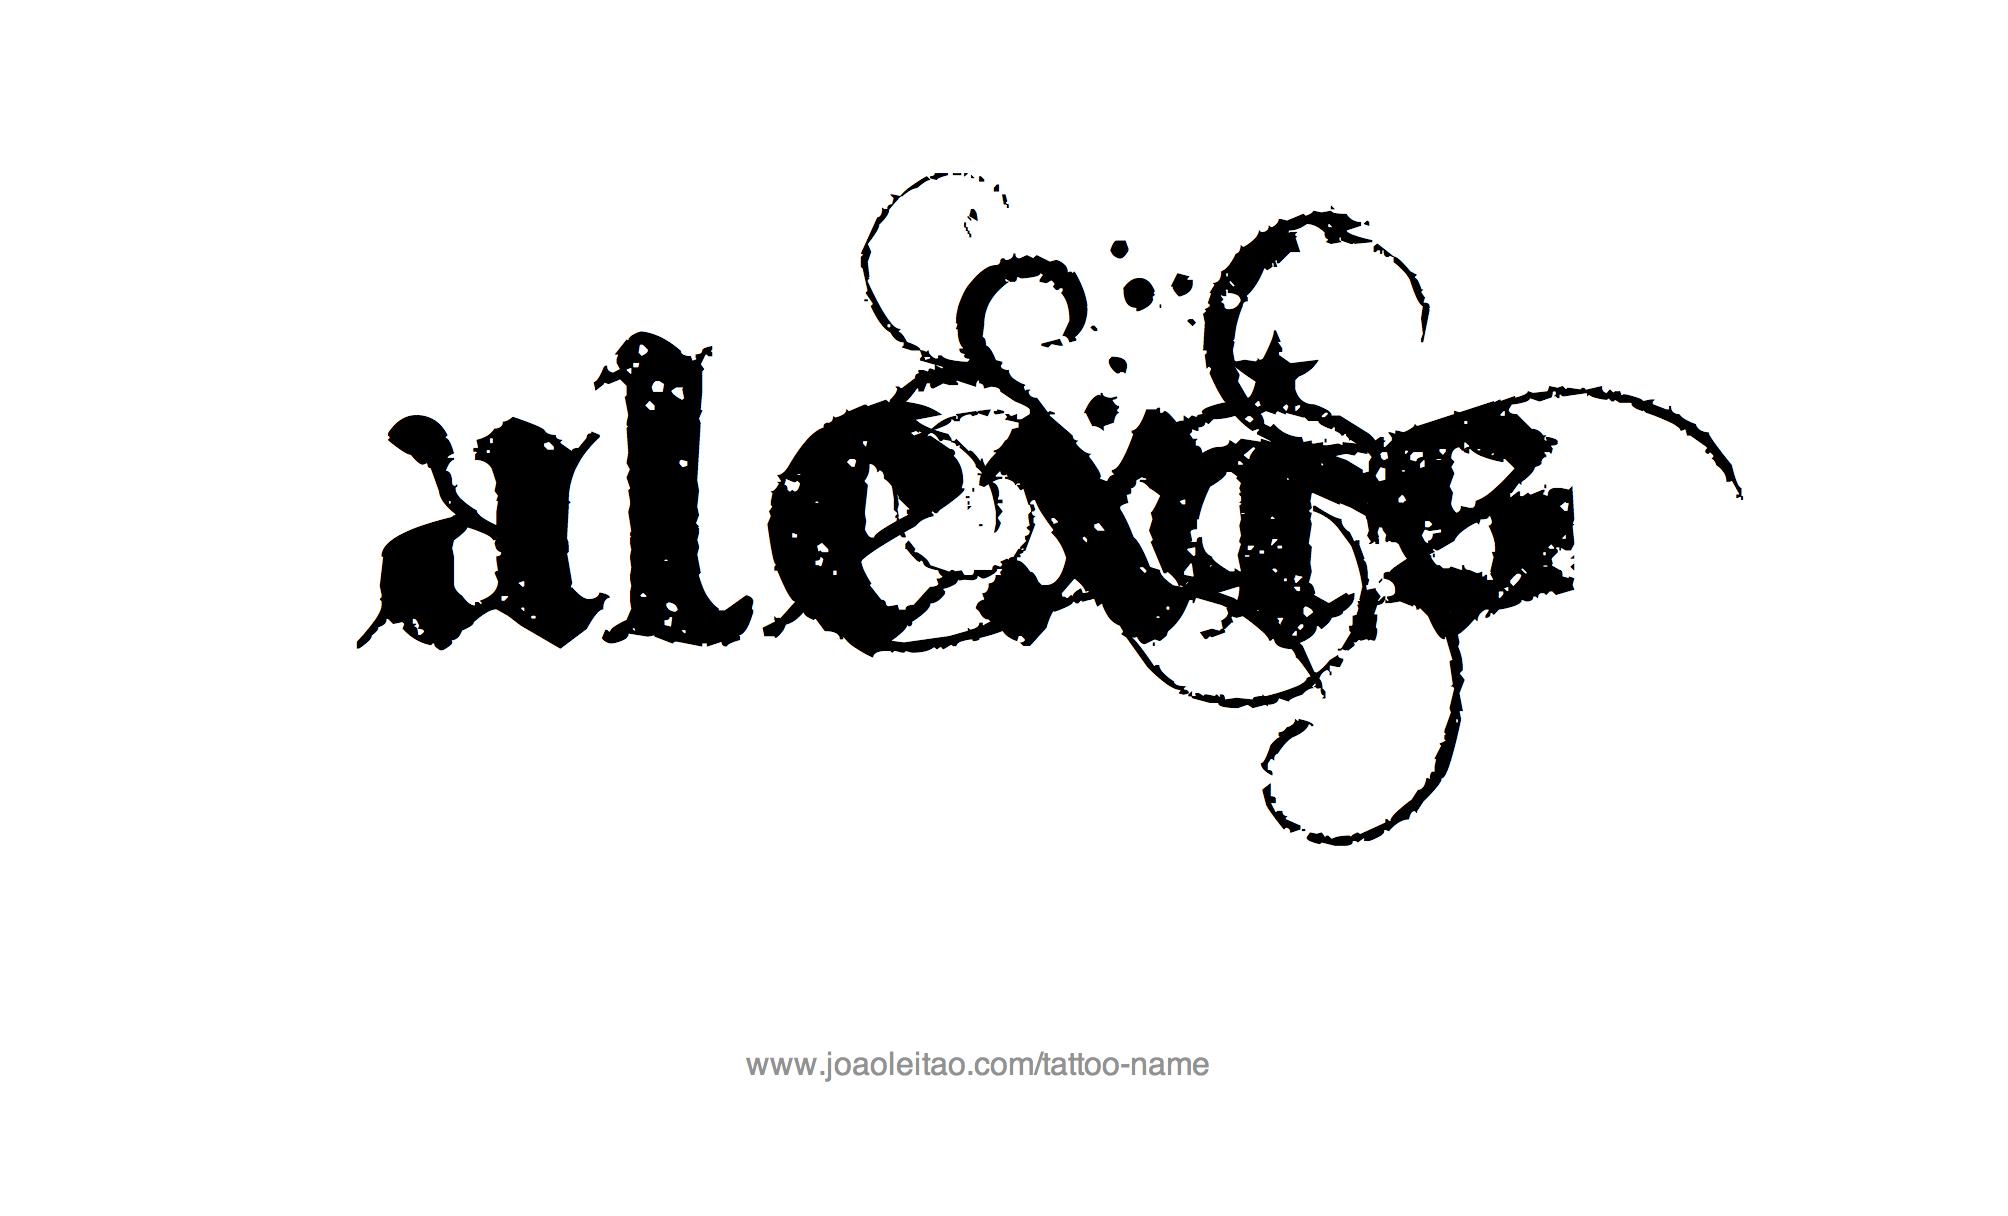 Alexis Name Tattoo Designs | Name tattoo designs, Names ...